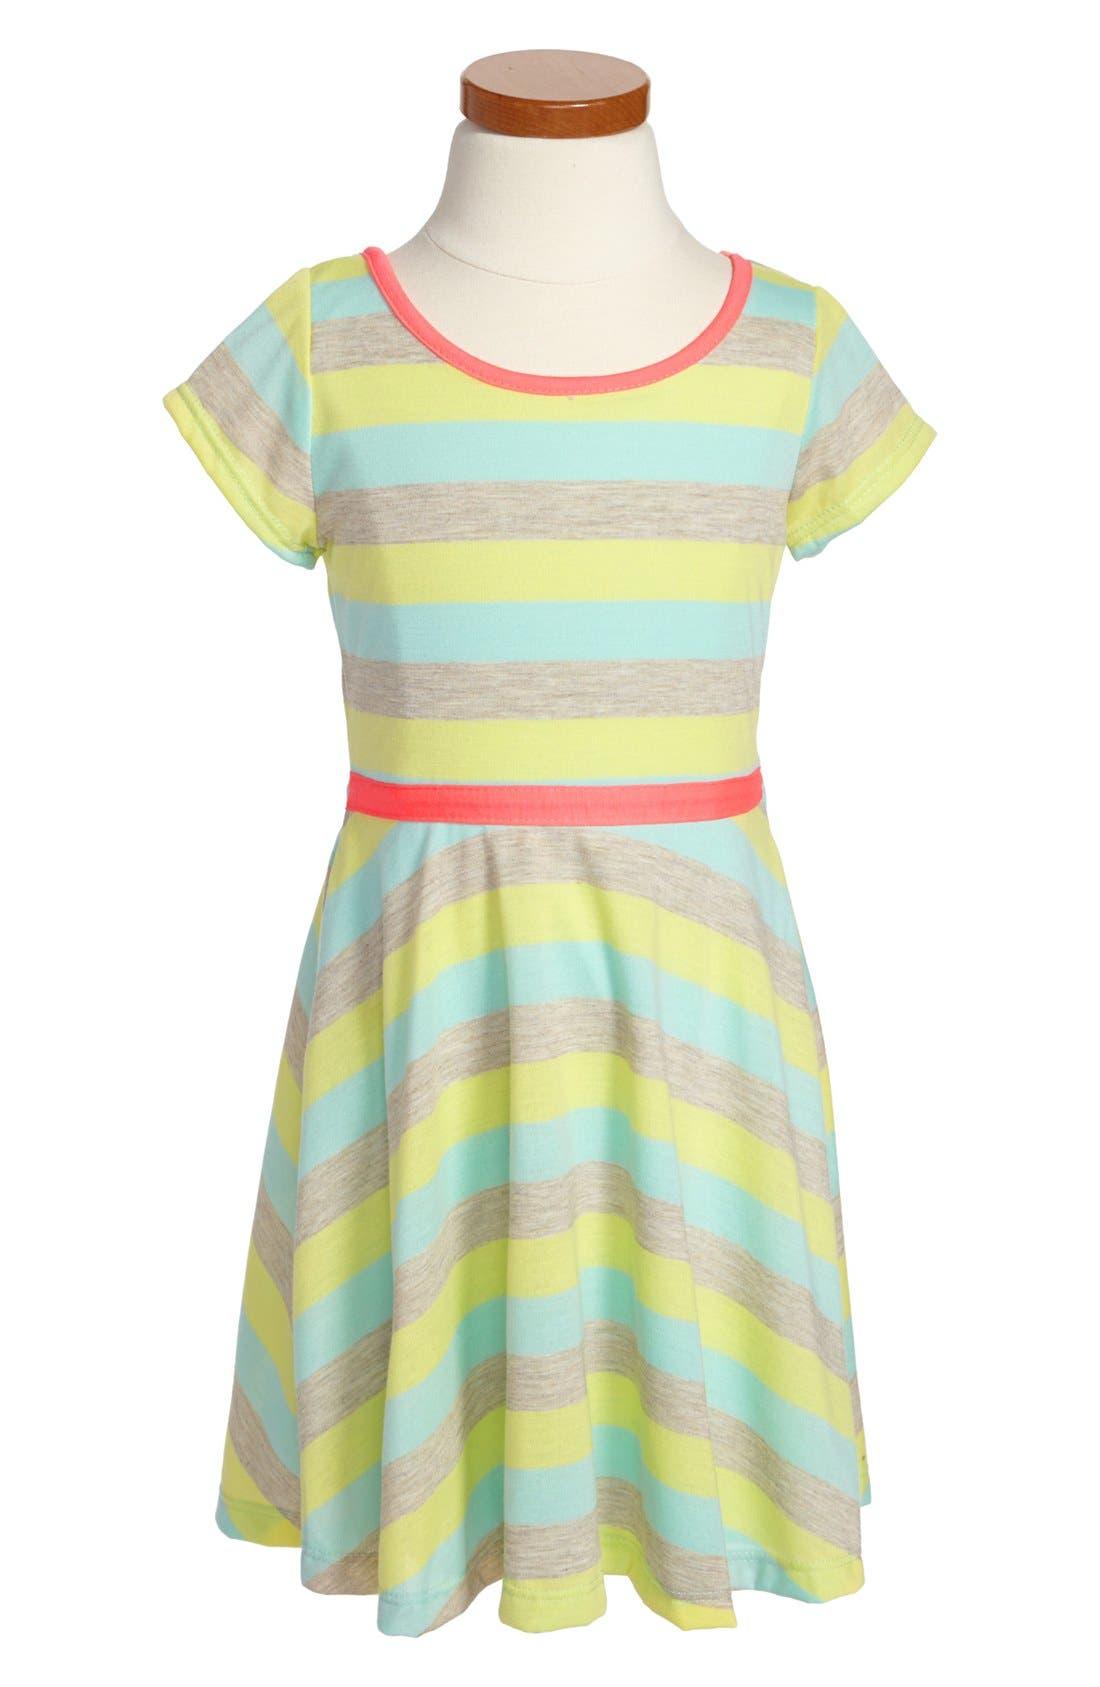 Alternate Image 1 Selected - Zunie Stripe Skater Dress (Little Girls & Big Girls)